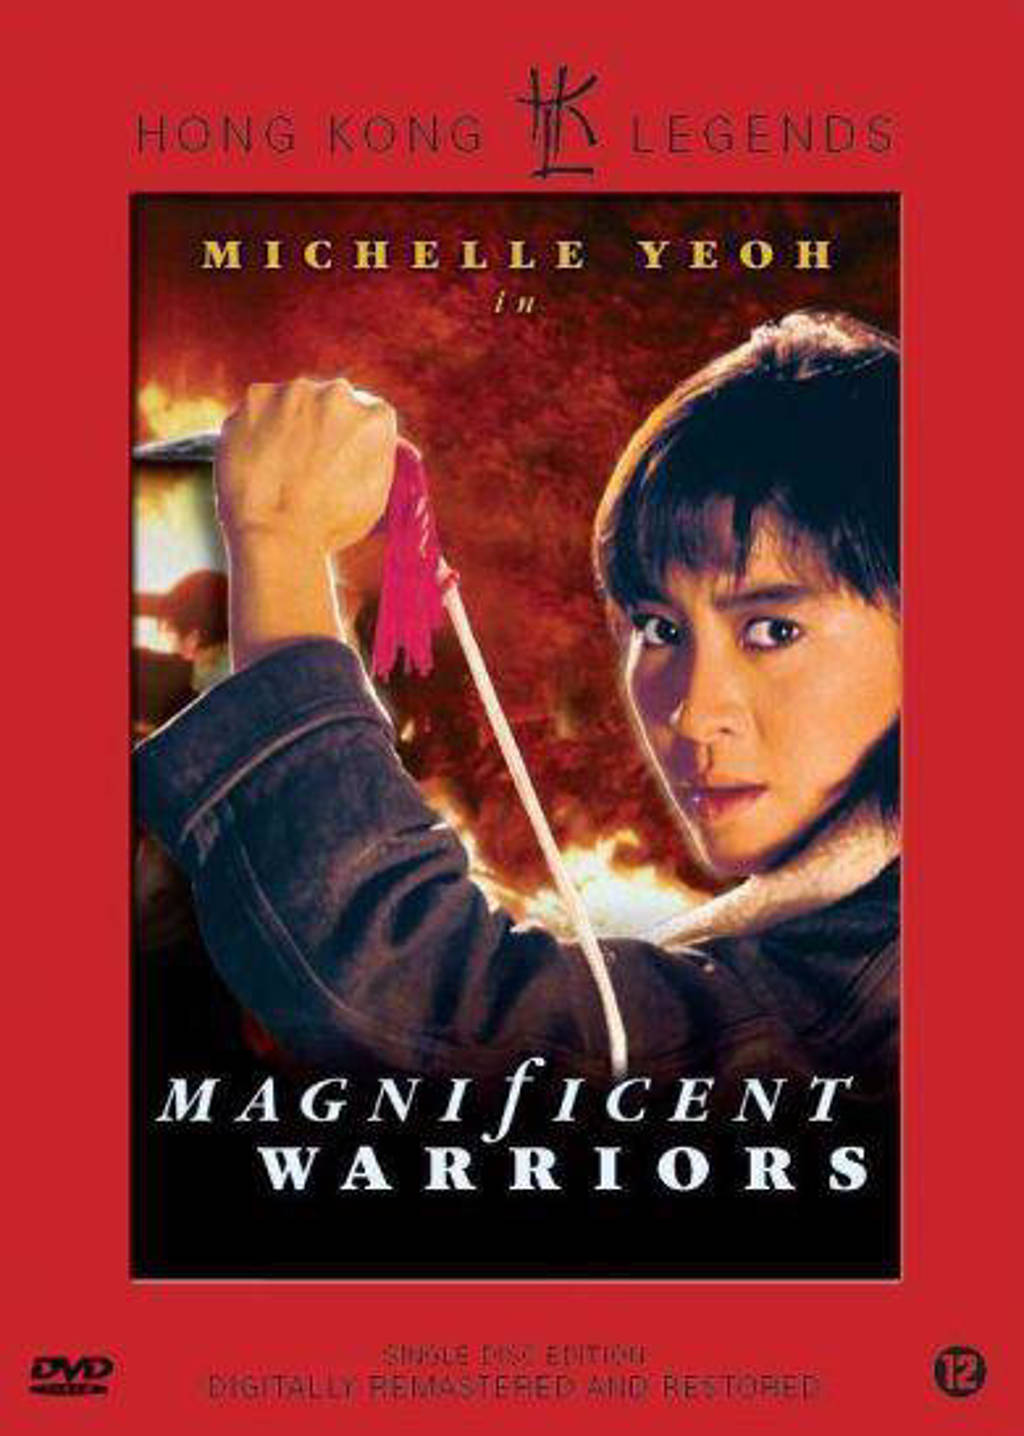 Magnificent warriors (DVD)